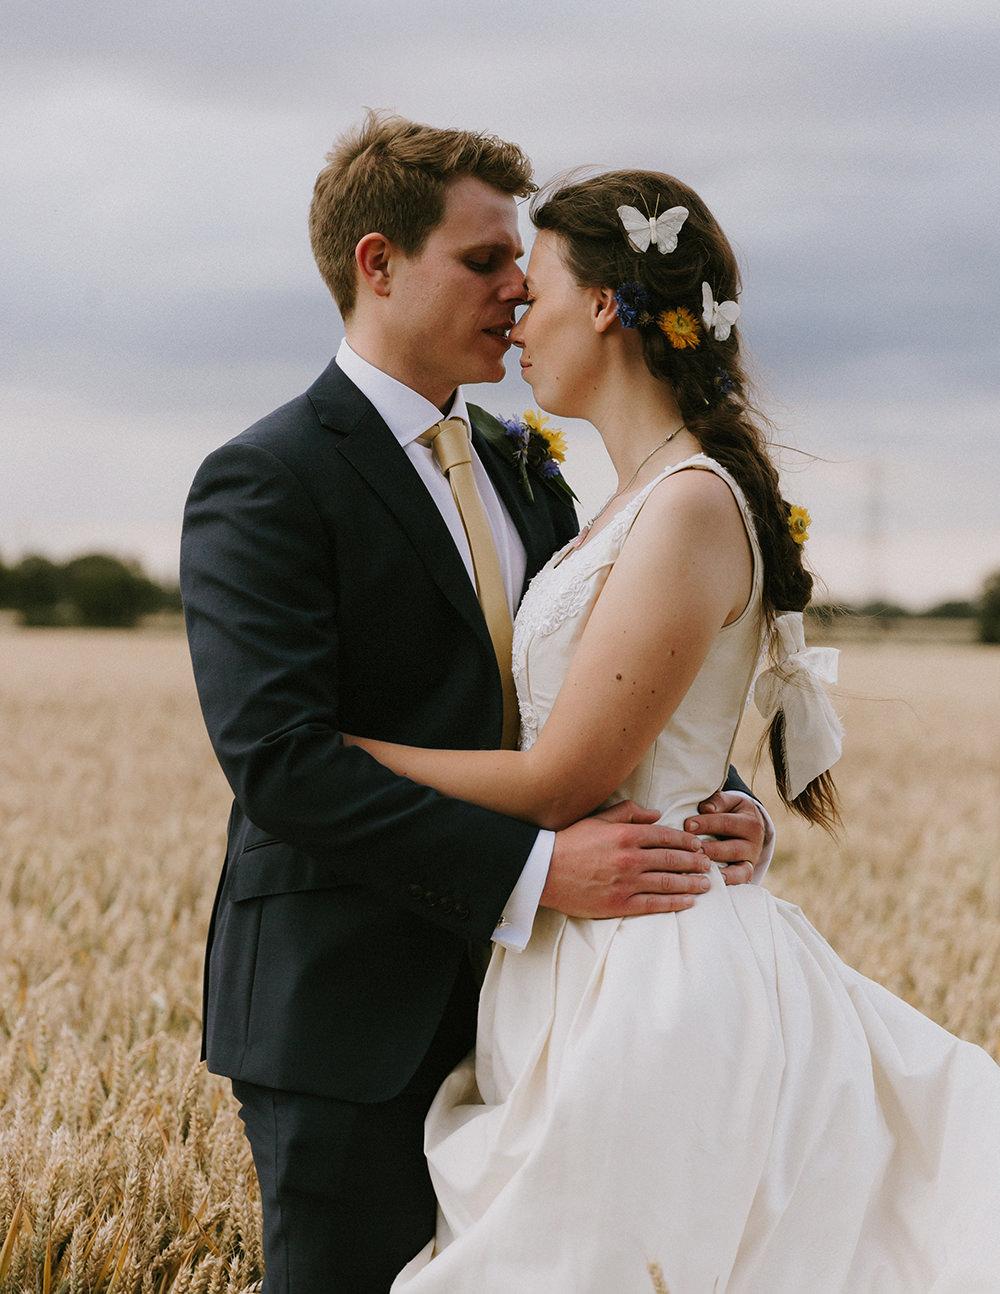 Bride Bridal Hair Style Plait Braids Butterflies Sunflowers Wedding Chris Bradshaw Photography